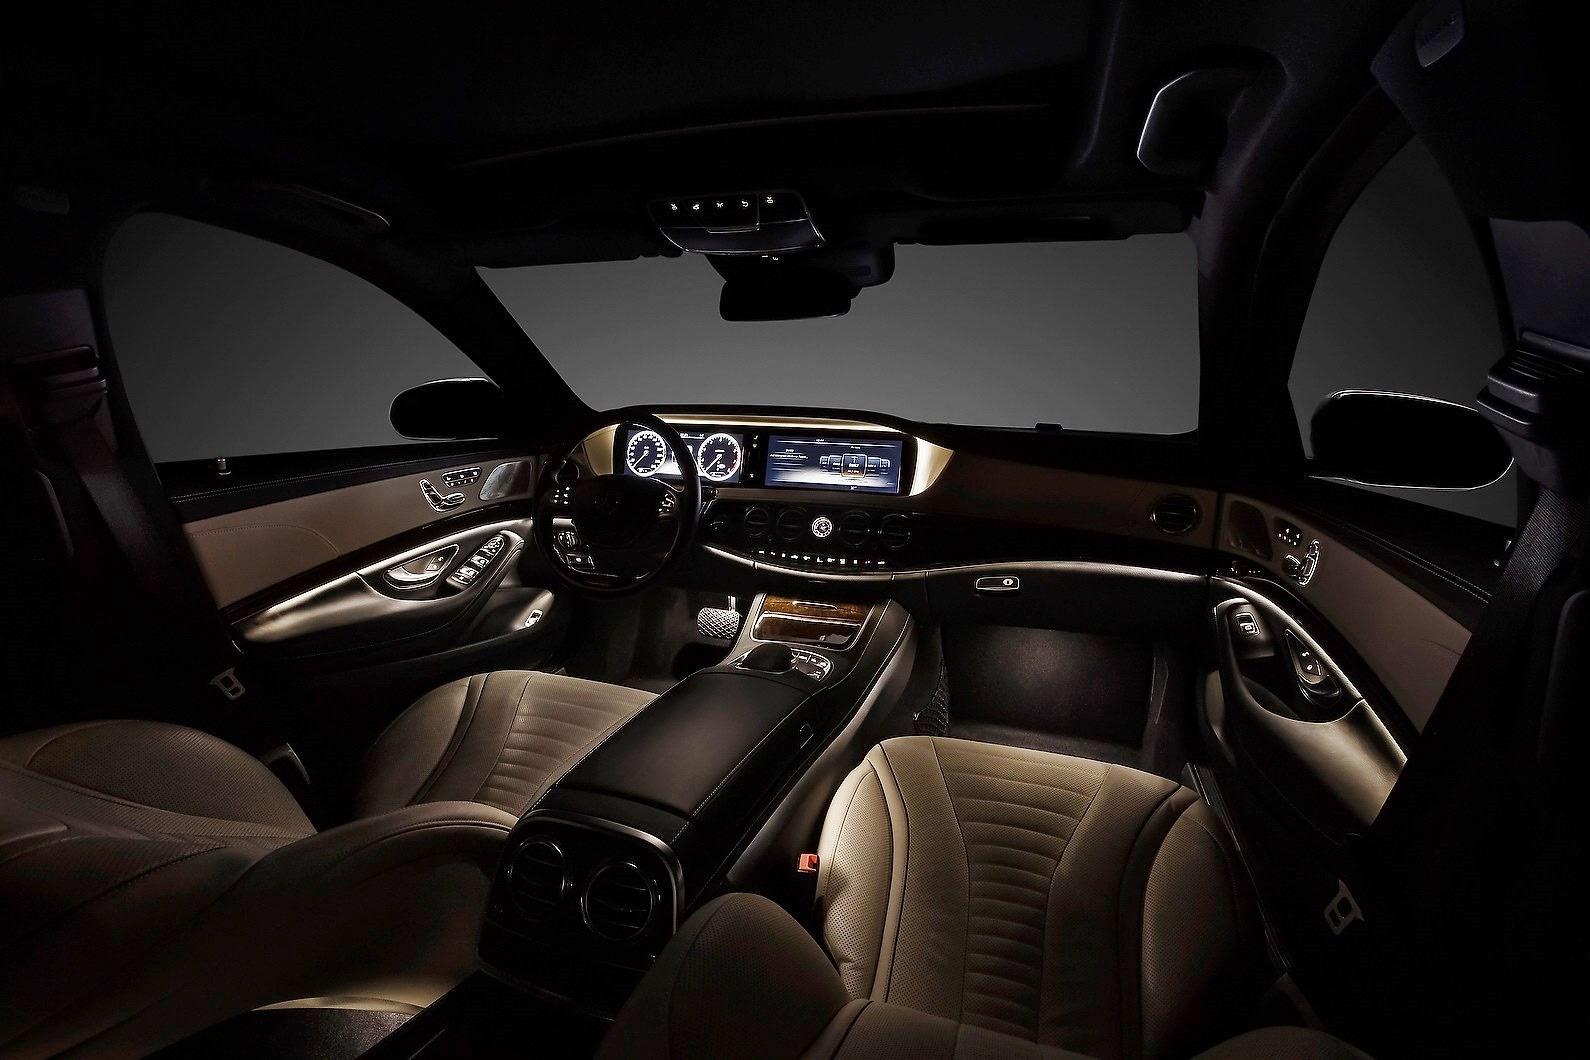 2014 mercedes benz s 63 amg car information news for Mercedes benz s550 interior